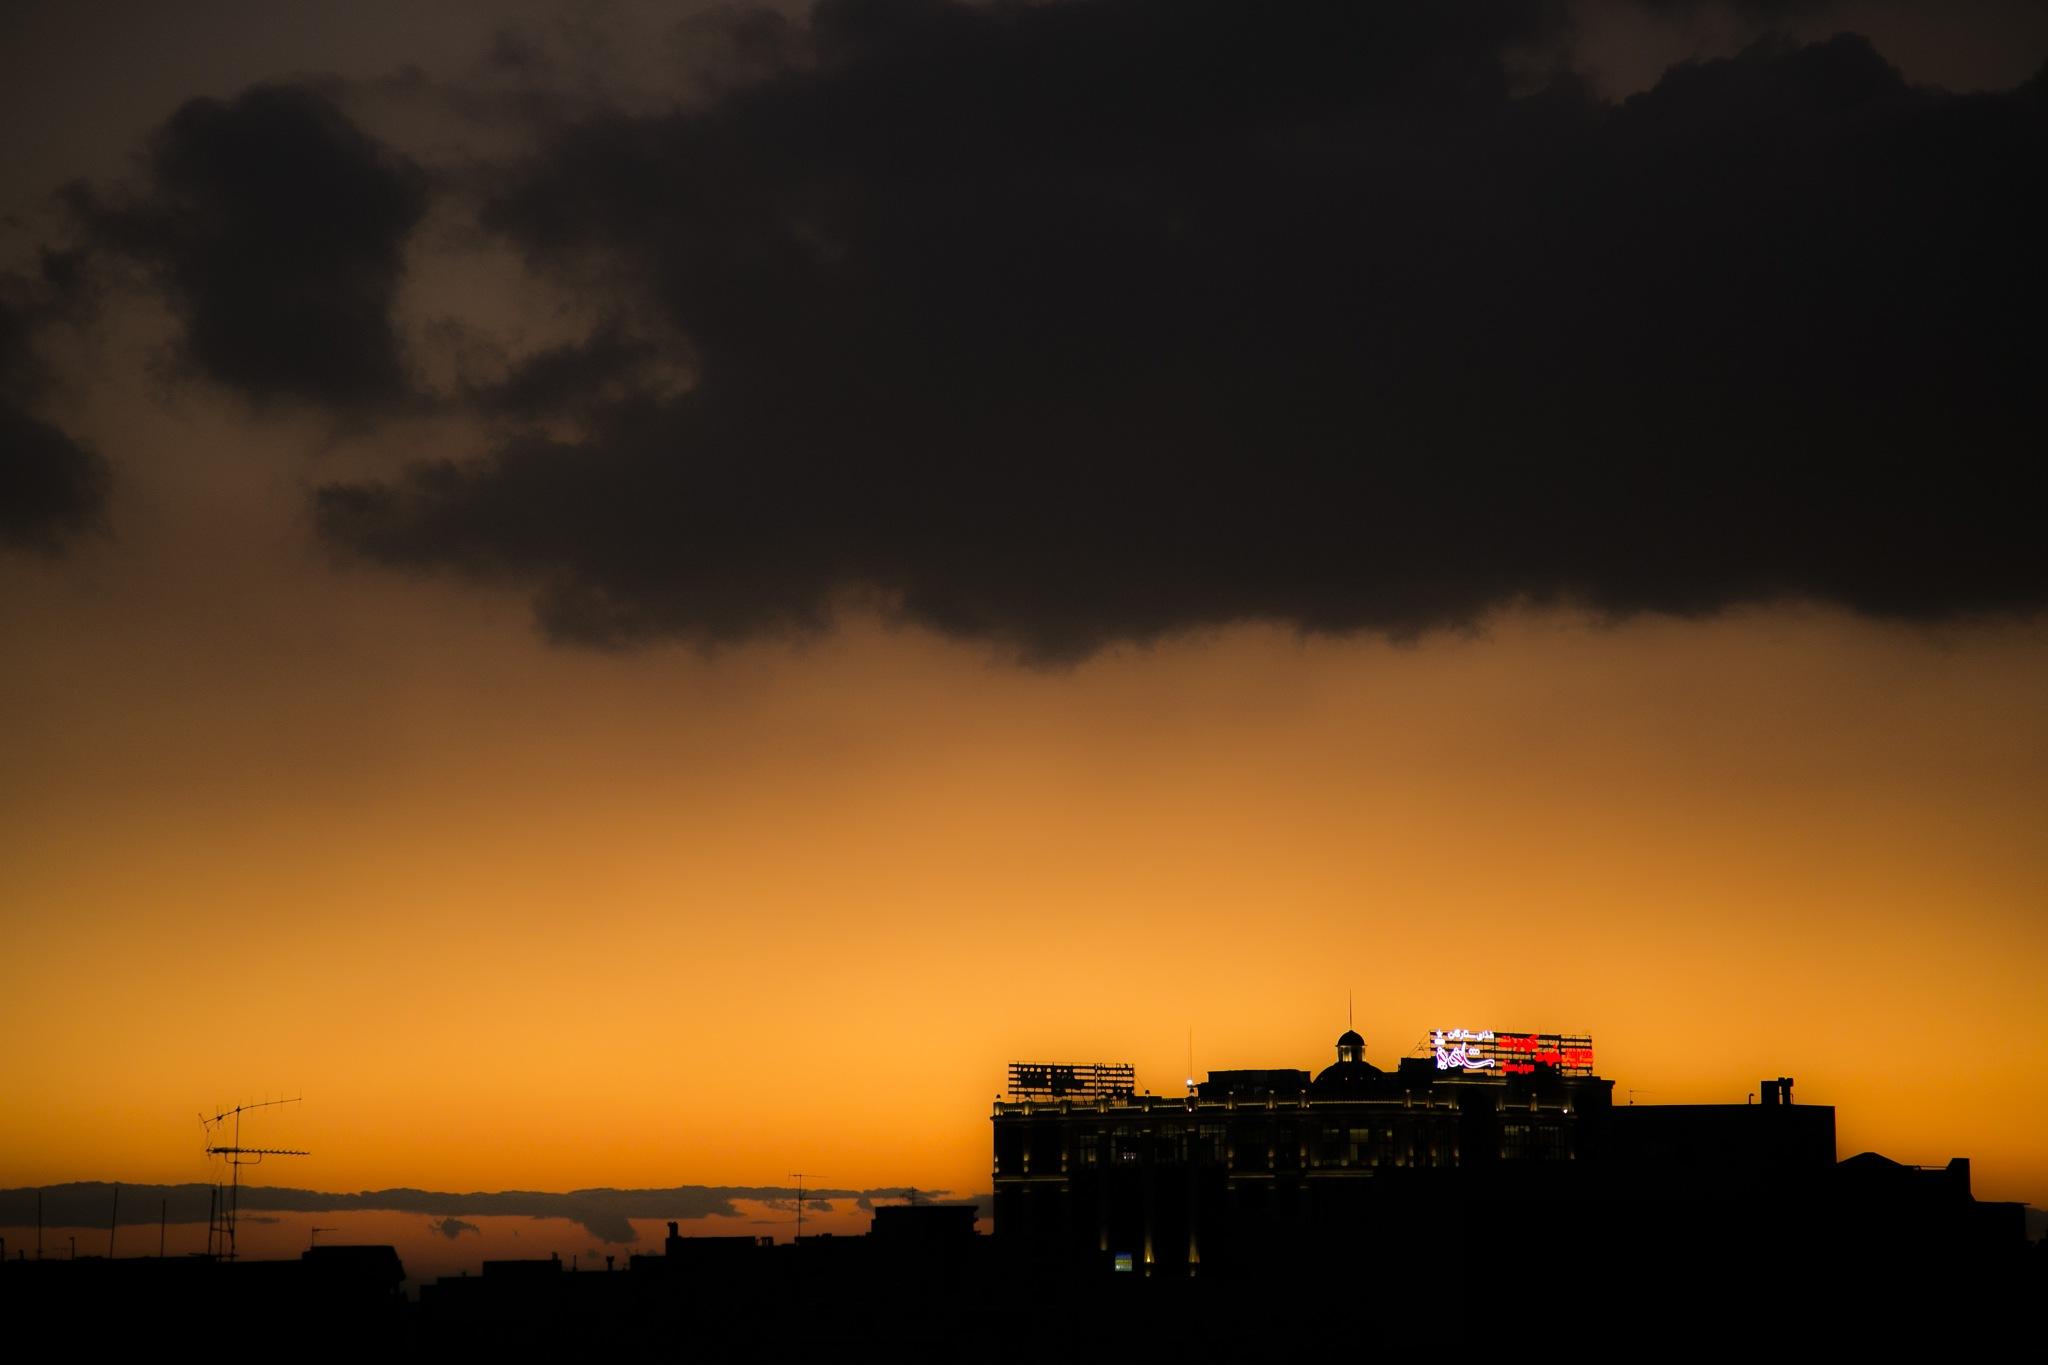 Tehran sunset by Babak Javid